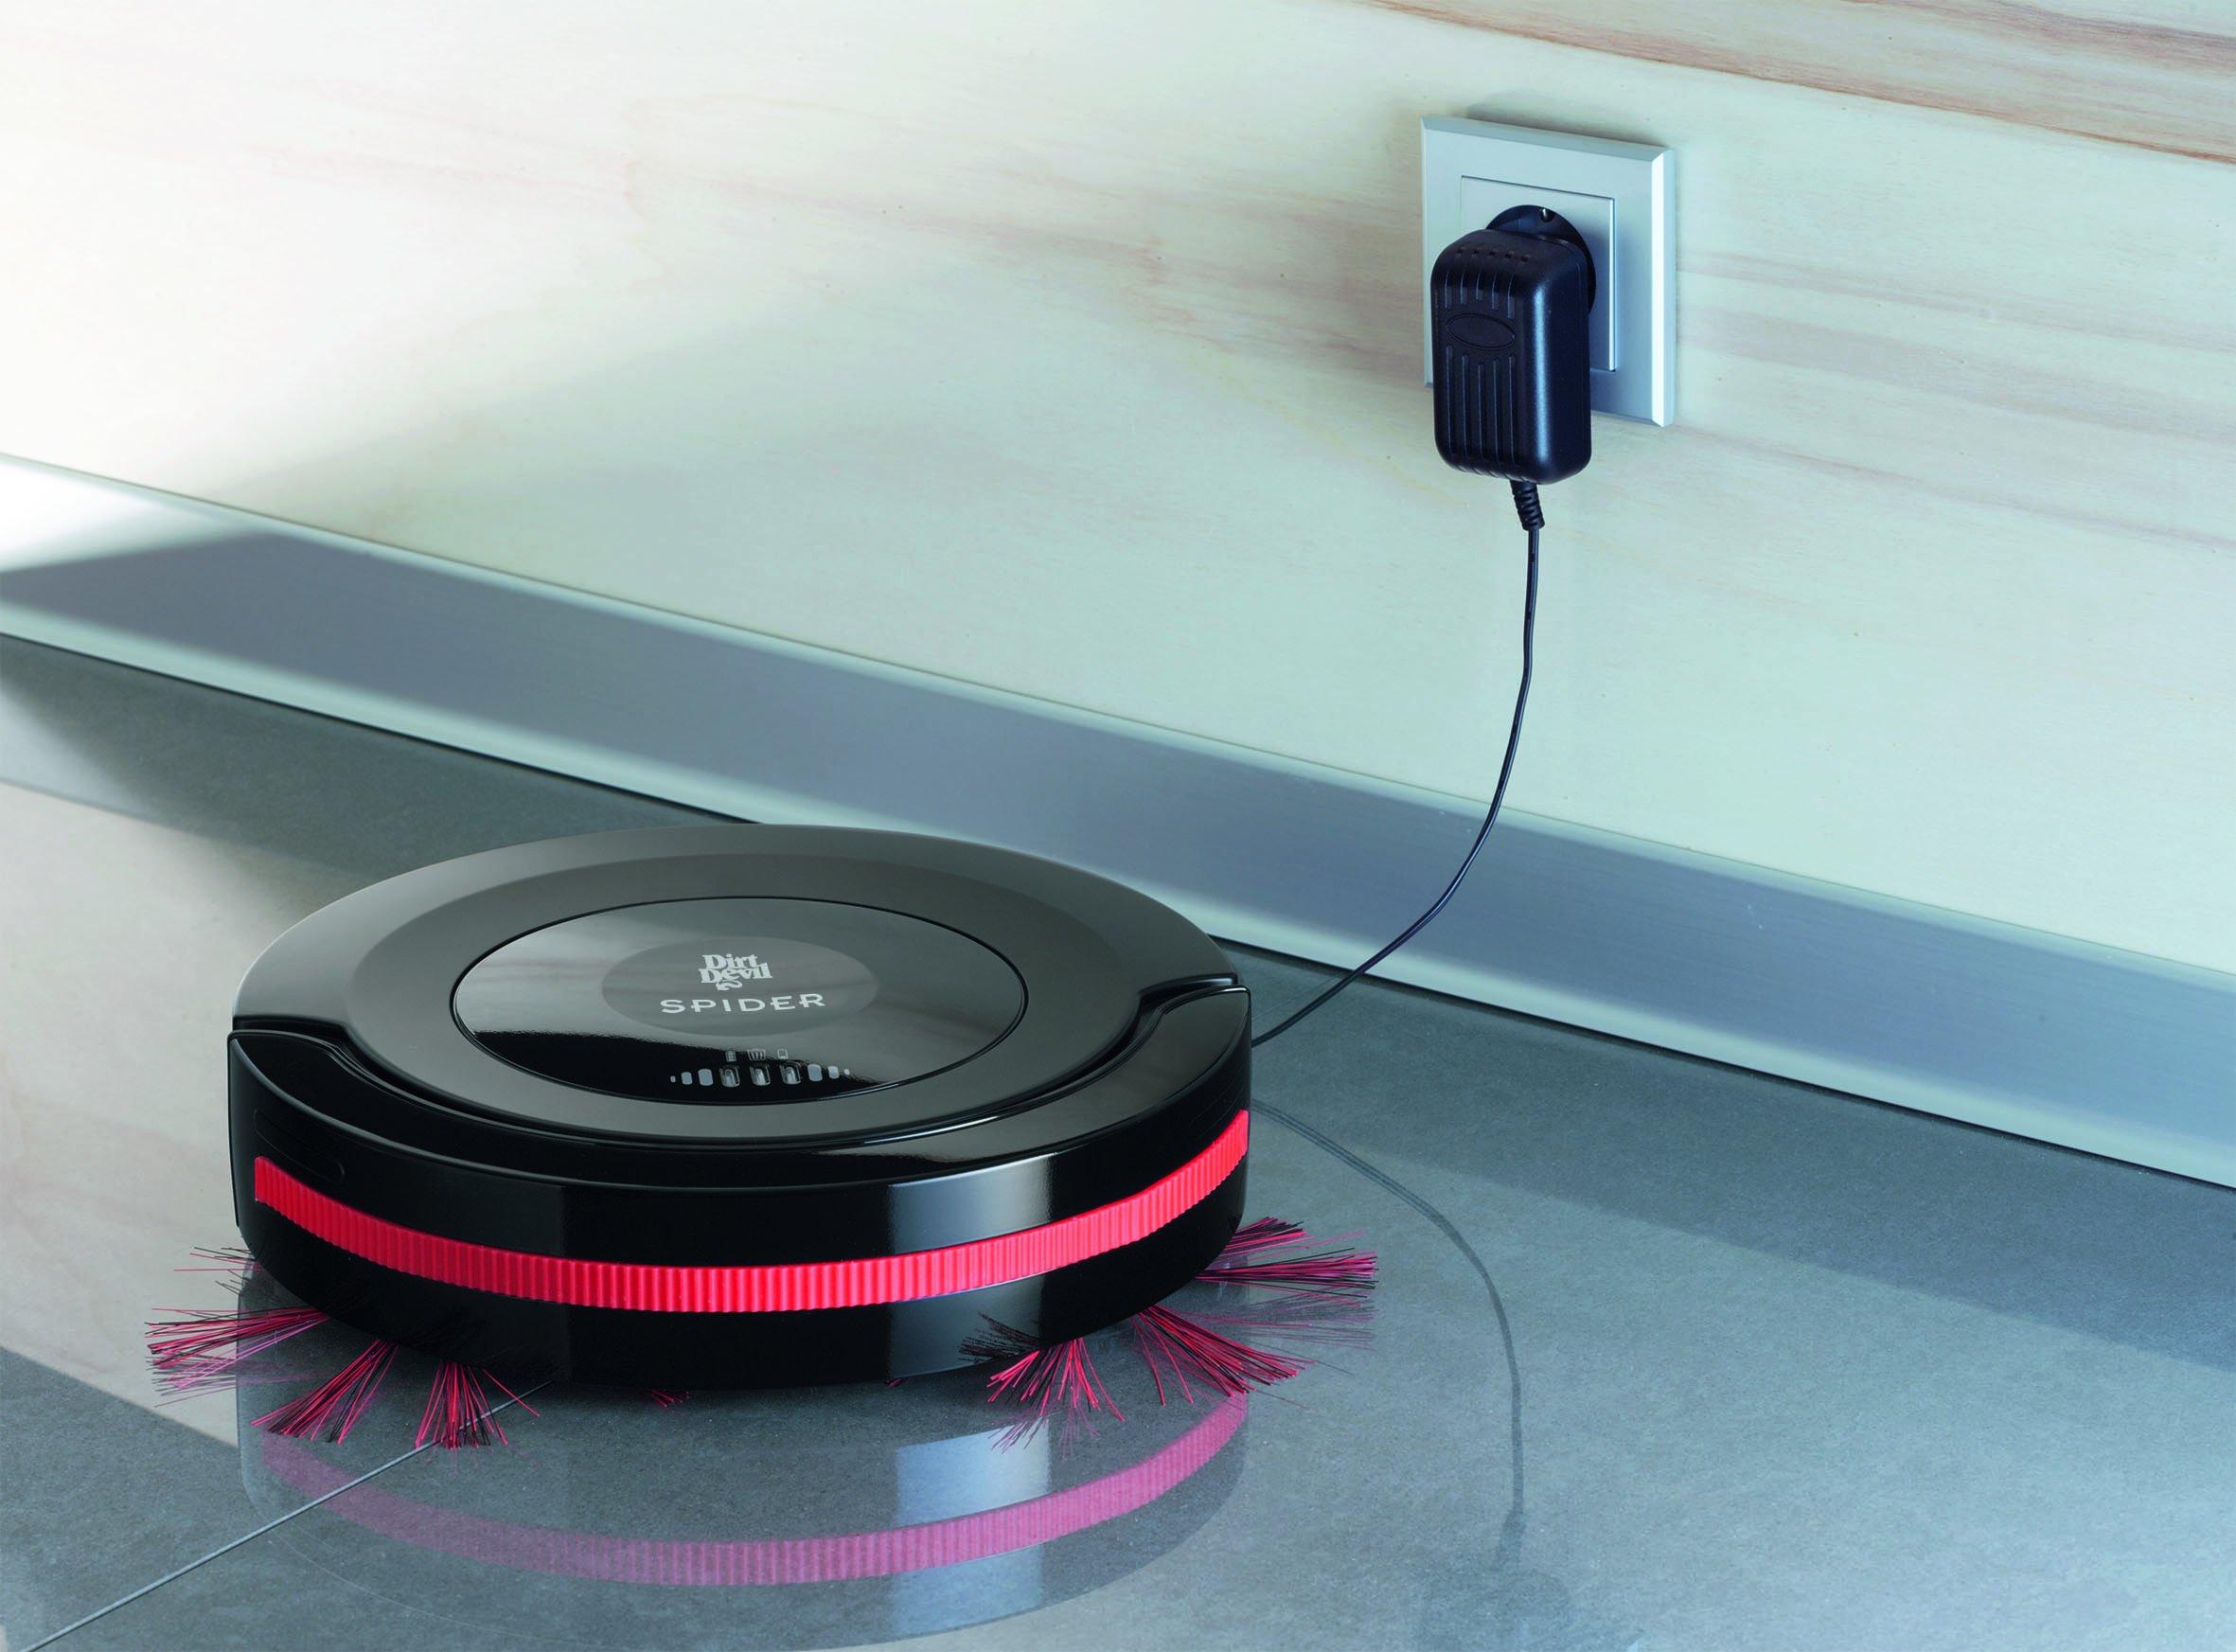 dirt devil m607 aspirateur robot spider cuisine maison. Black Bedroom Furniture Sets. Home Design Ideas